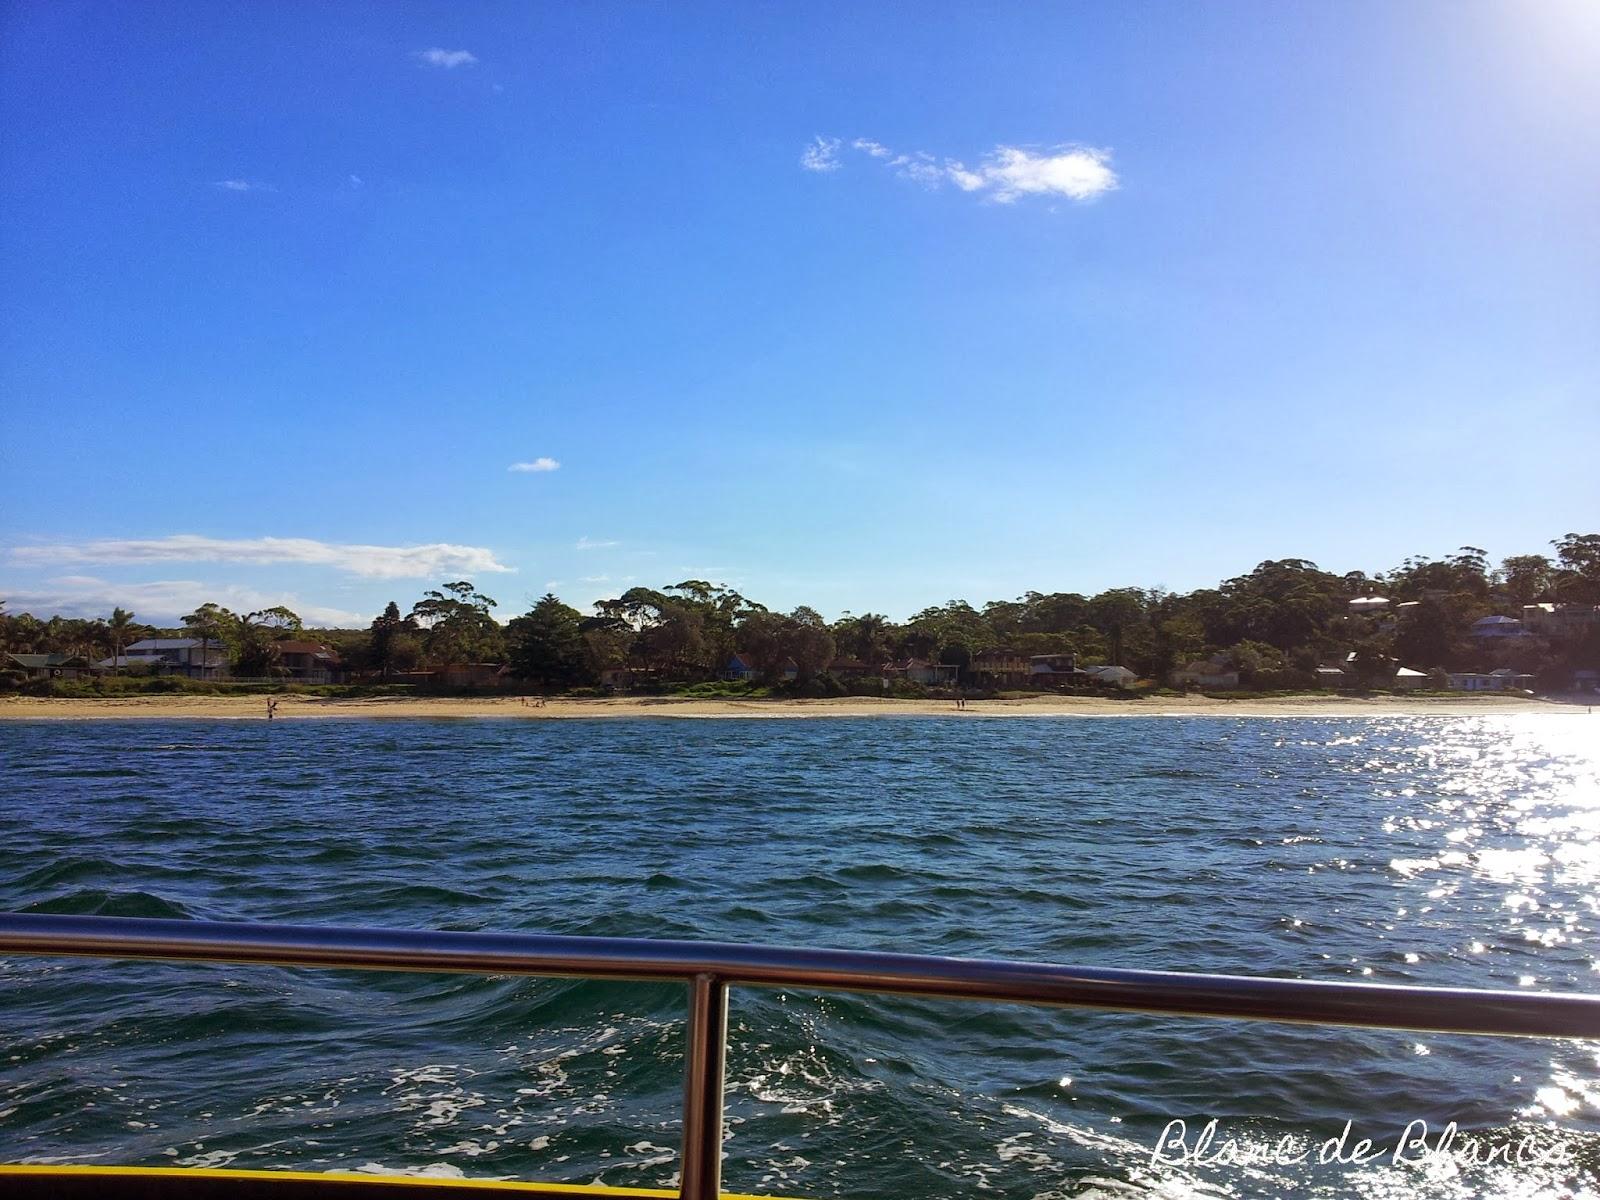 Merta ja rantaa Sydneyn Cronullassa - www.blancdeblancs.fi